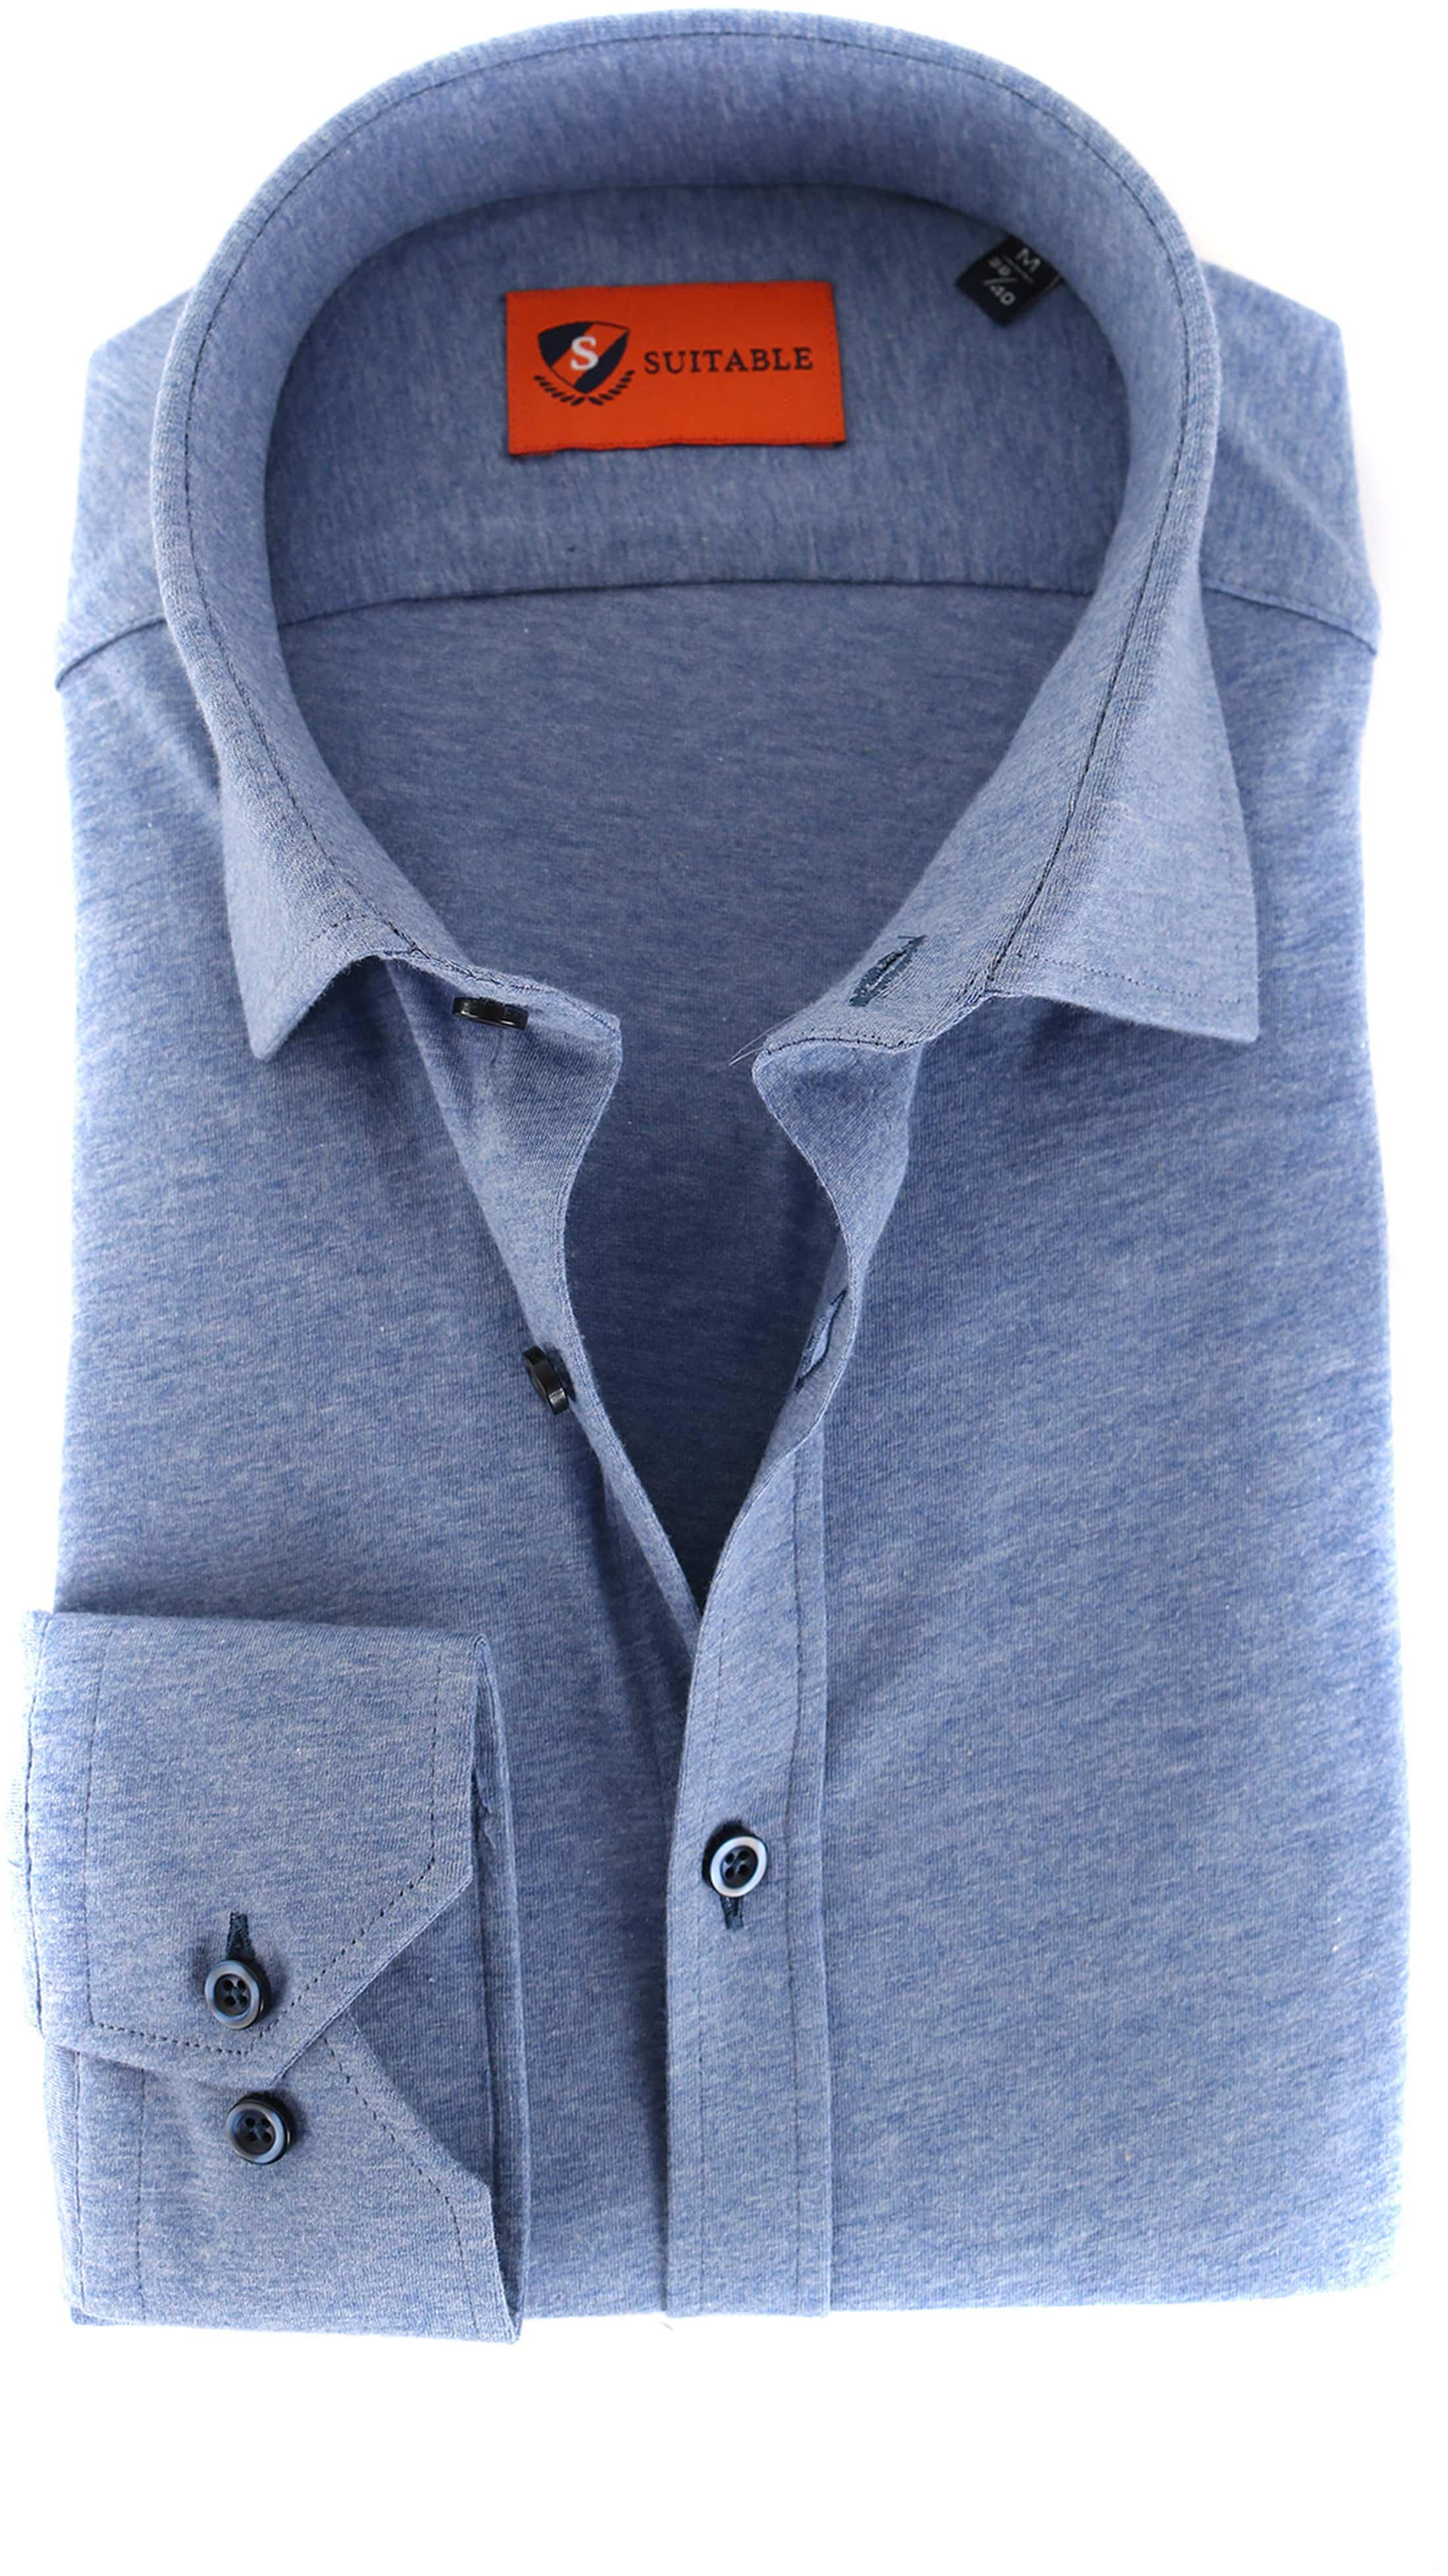 Suitable Overhemd Jersey Lichtblauw foto 0